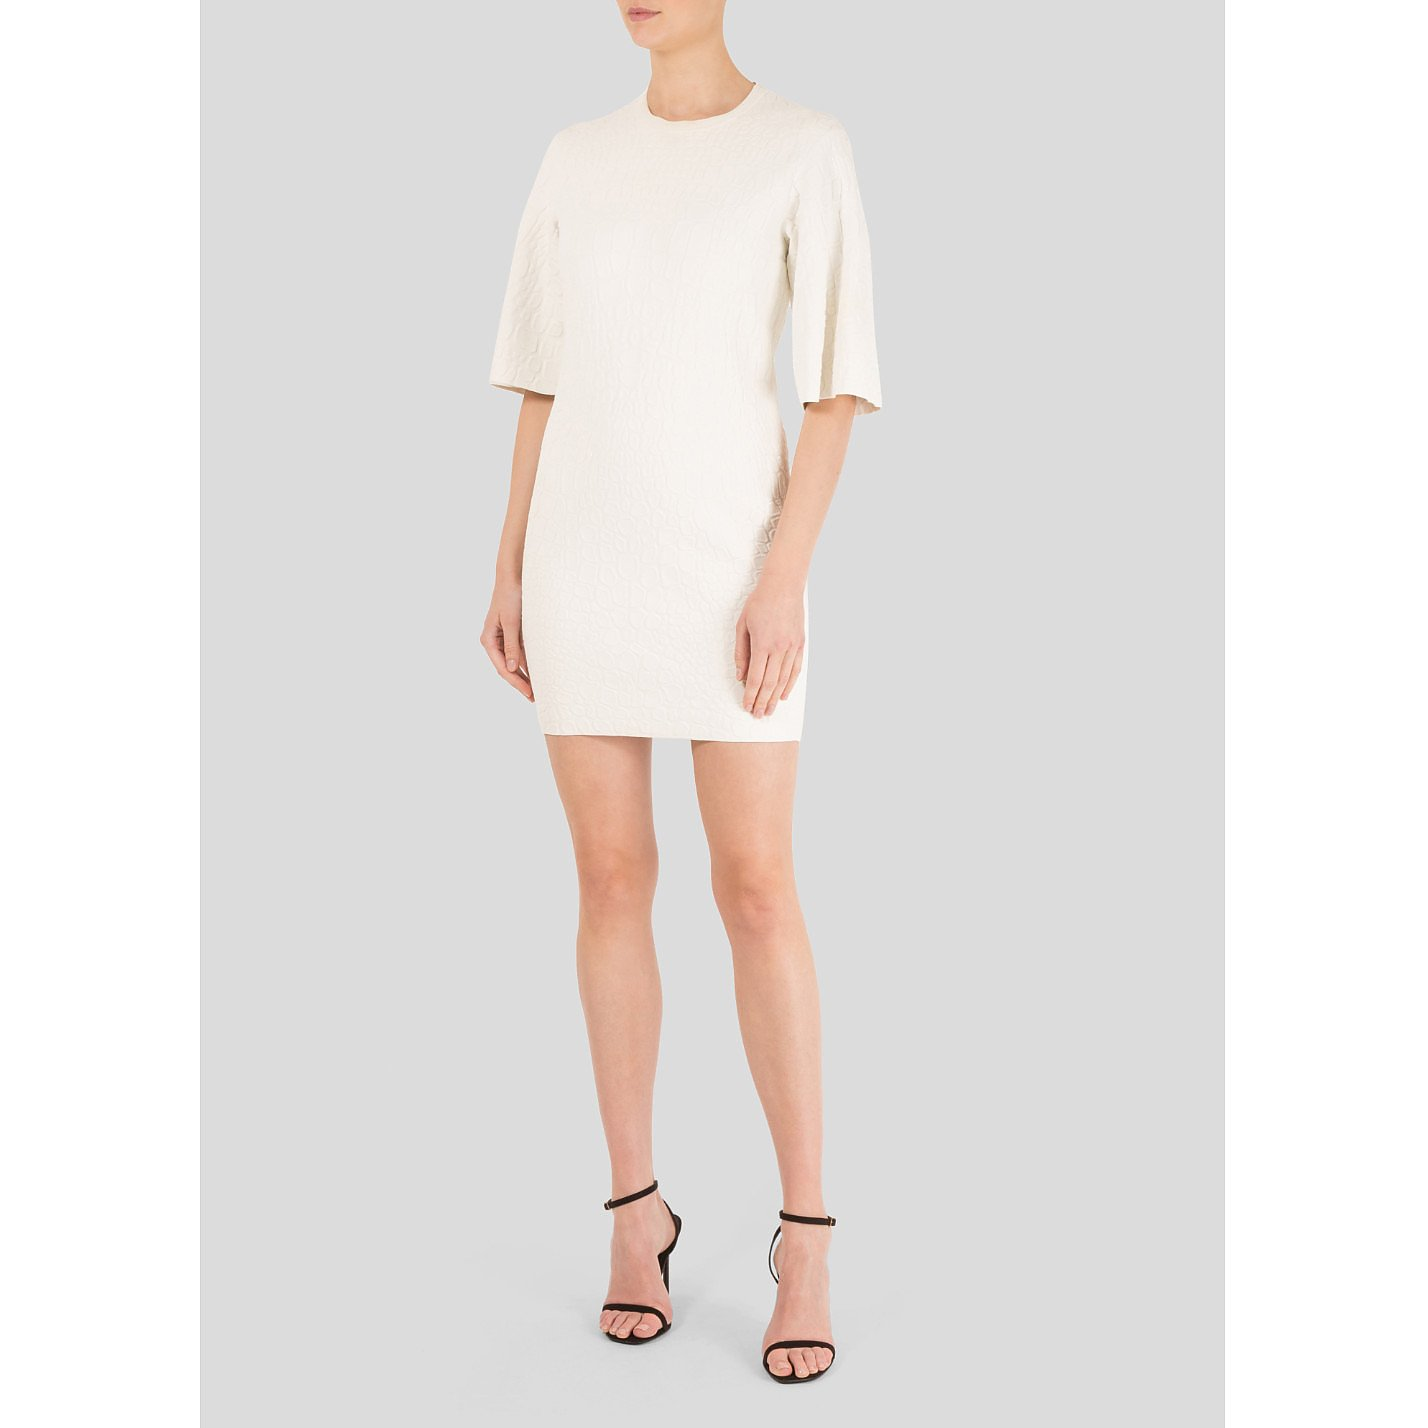 Alexander McQueen Textured Stretch Mini Dress